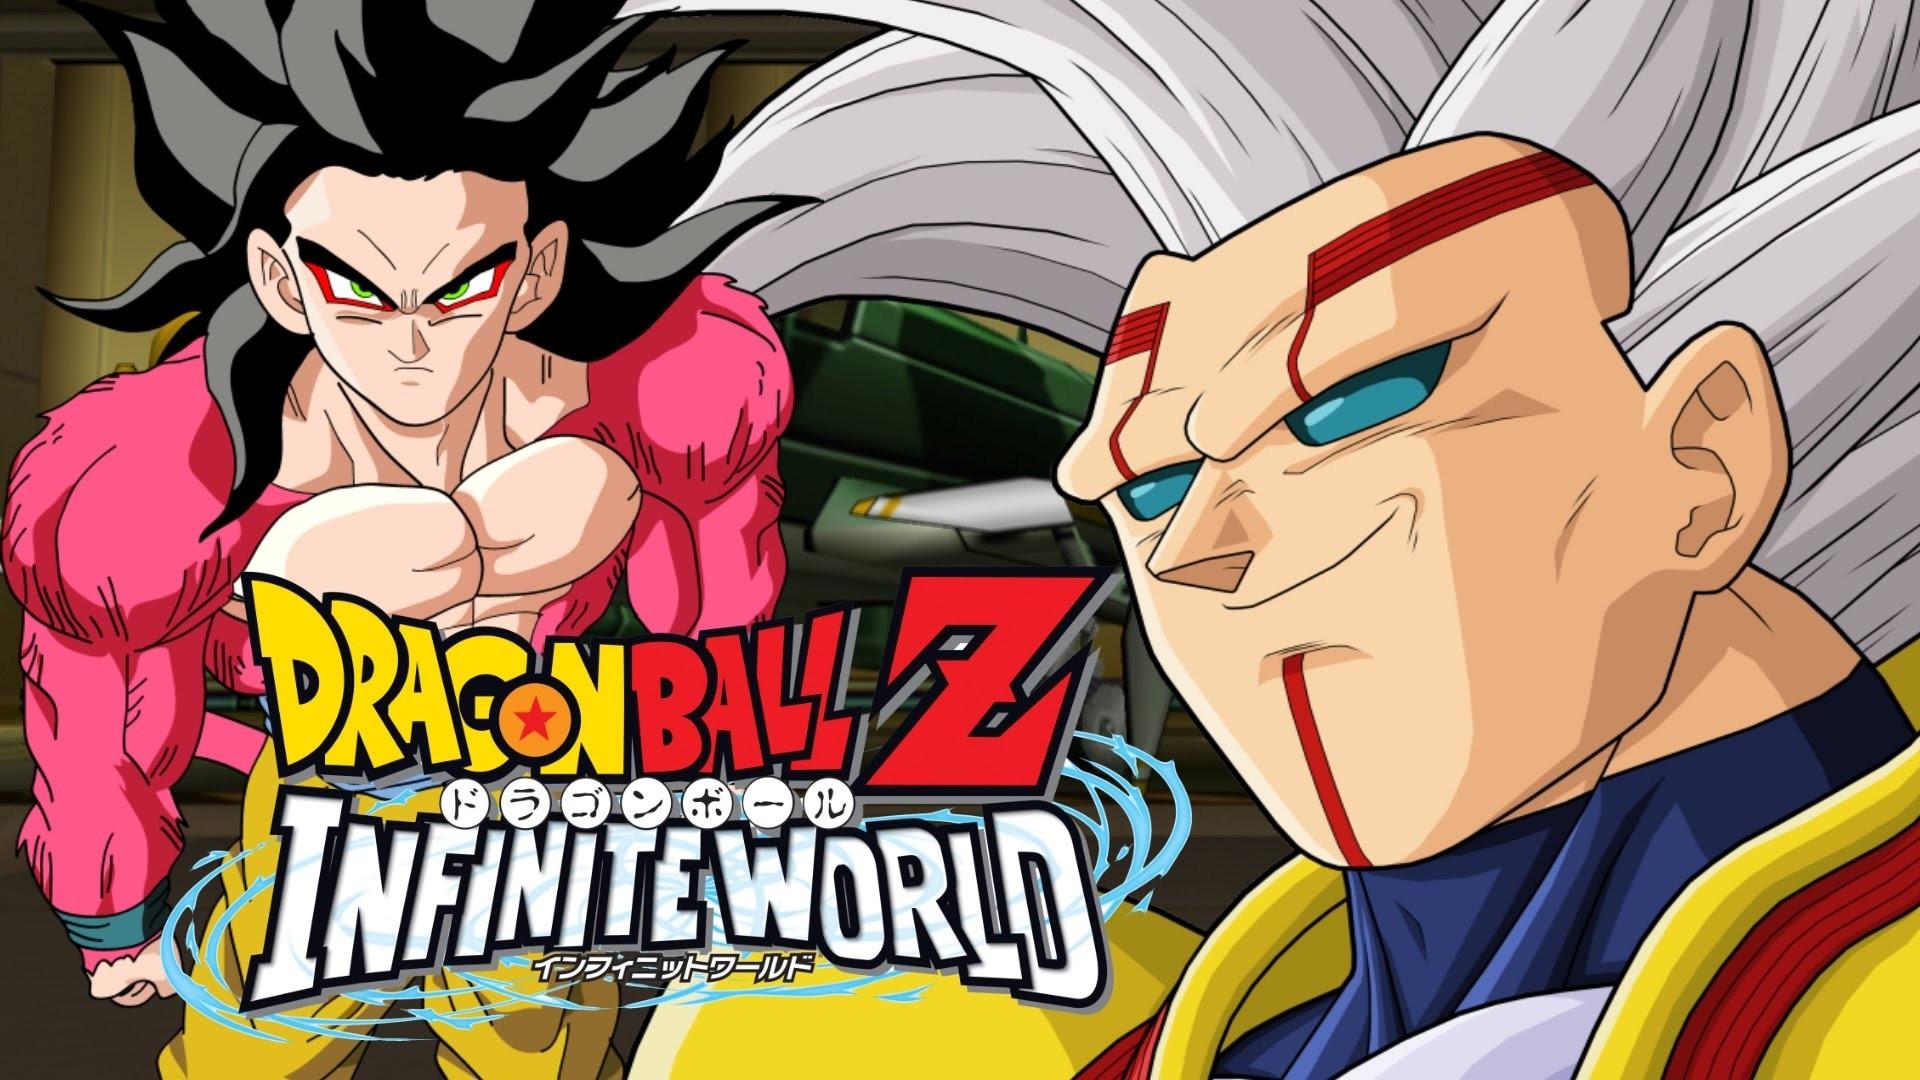 Dragon Ball Z Infinite World – SSJ4 Goku vs Super Baby Vegeta BEST QUALITY  – YouTube